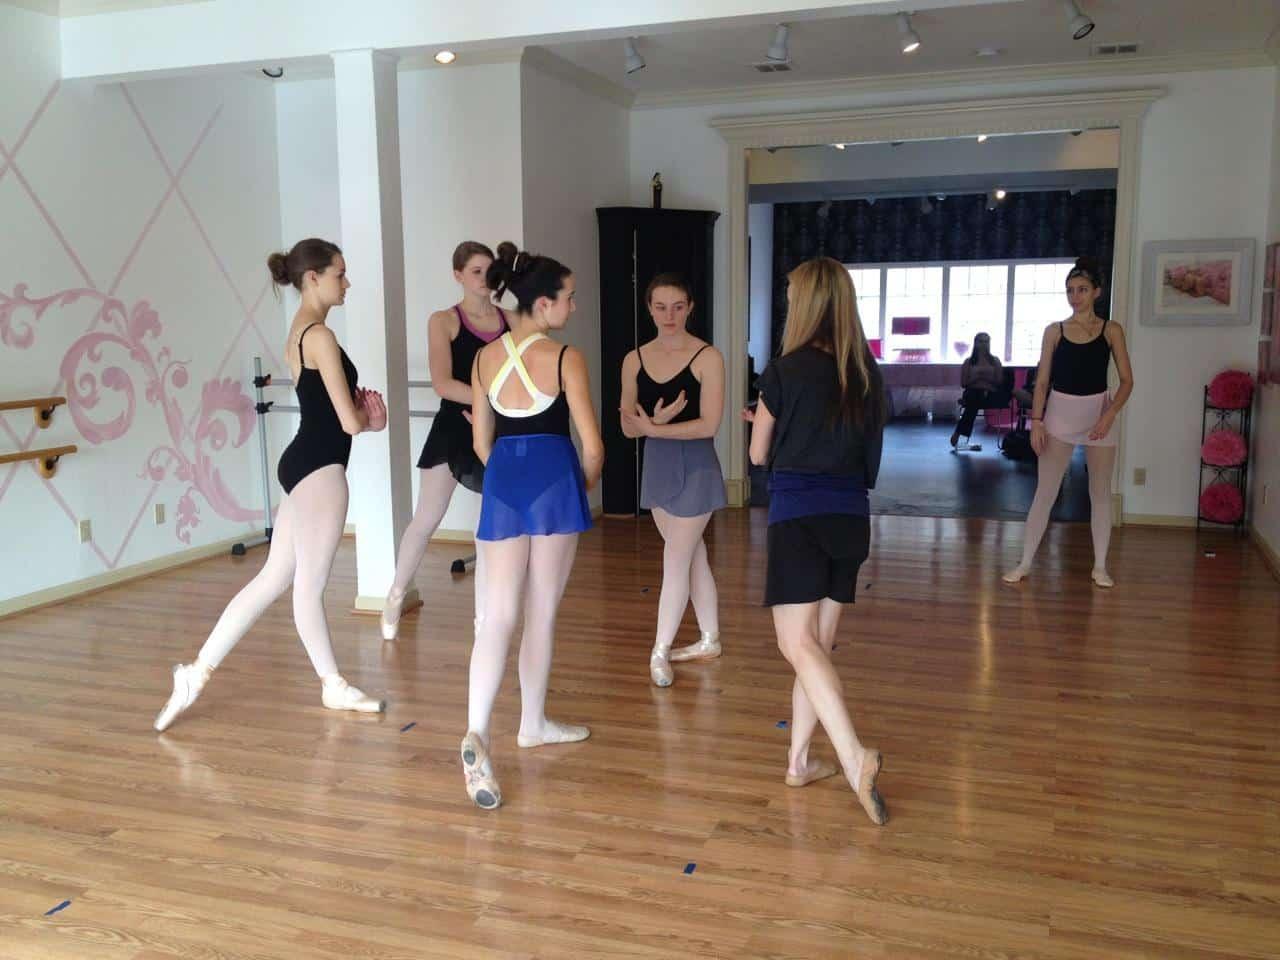 dance seminar dance philosophy History and philosophy of dance: 3: dance 370: advanced studies in dance: 1-3: kin 355: biomechanics: 3: 2 credits from the following: 2:  senior seminar (3-0) cr 3.